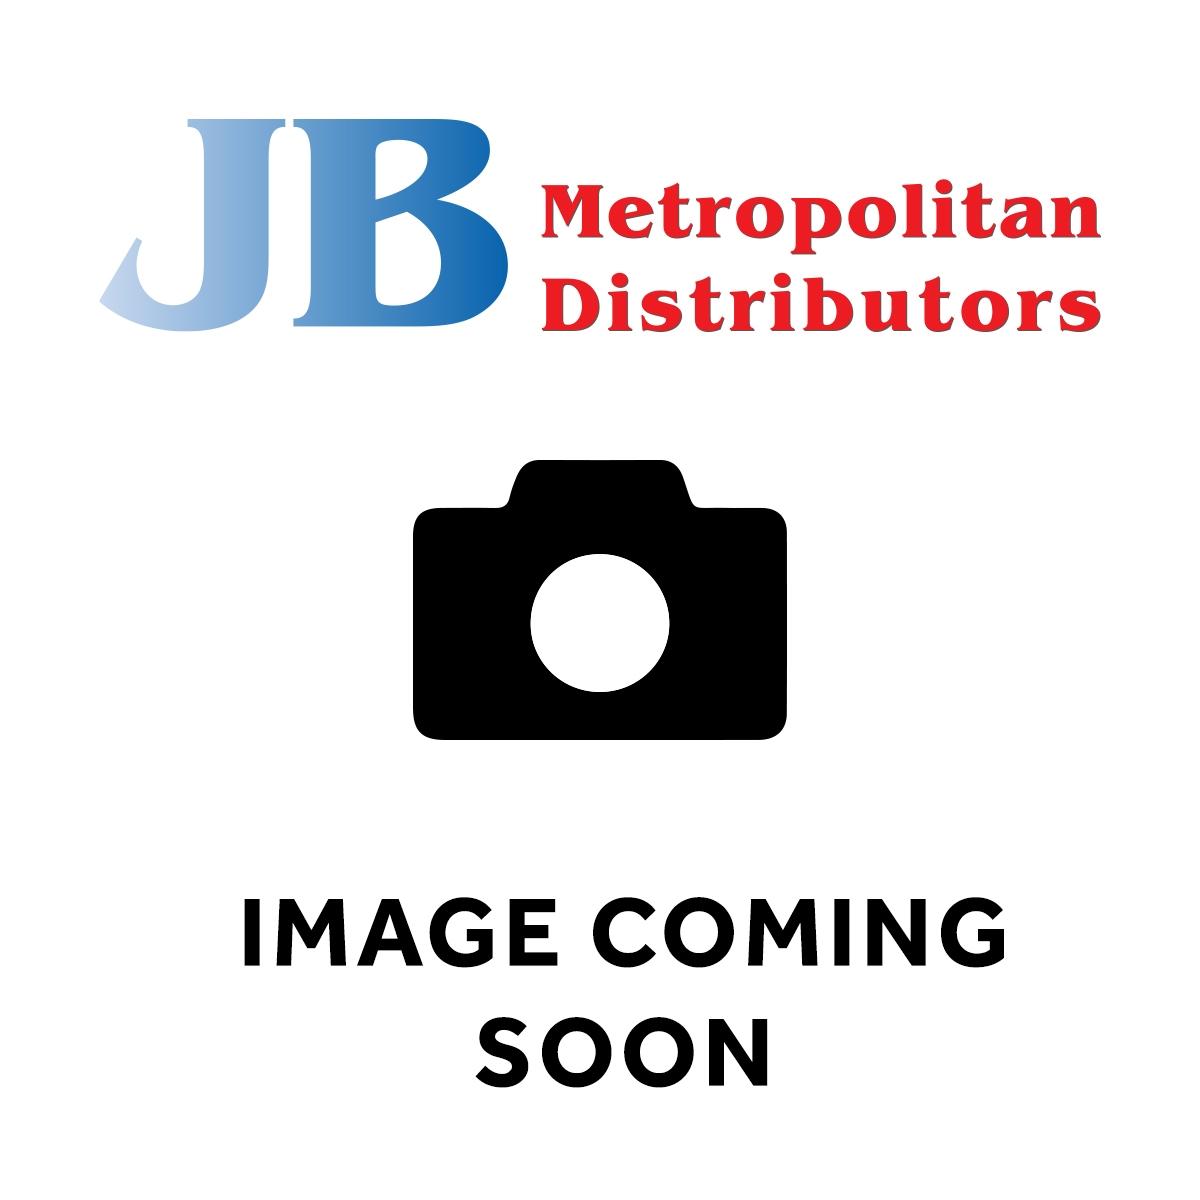 GRAN FUDGE CARAMEL 100G (12)